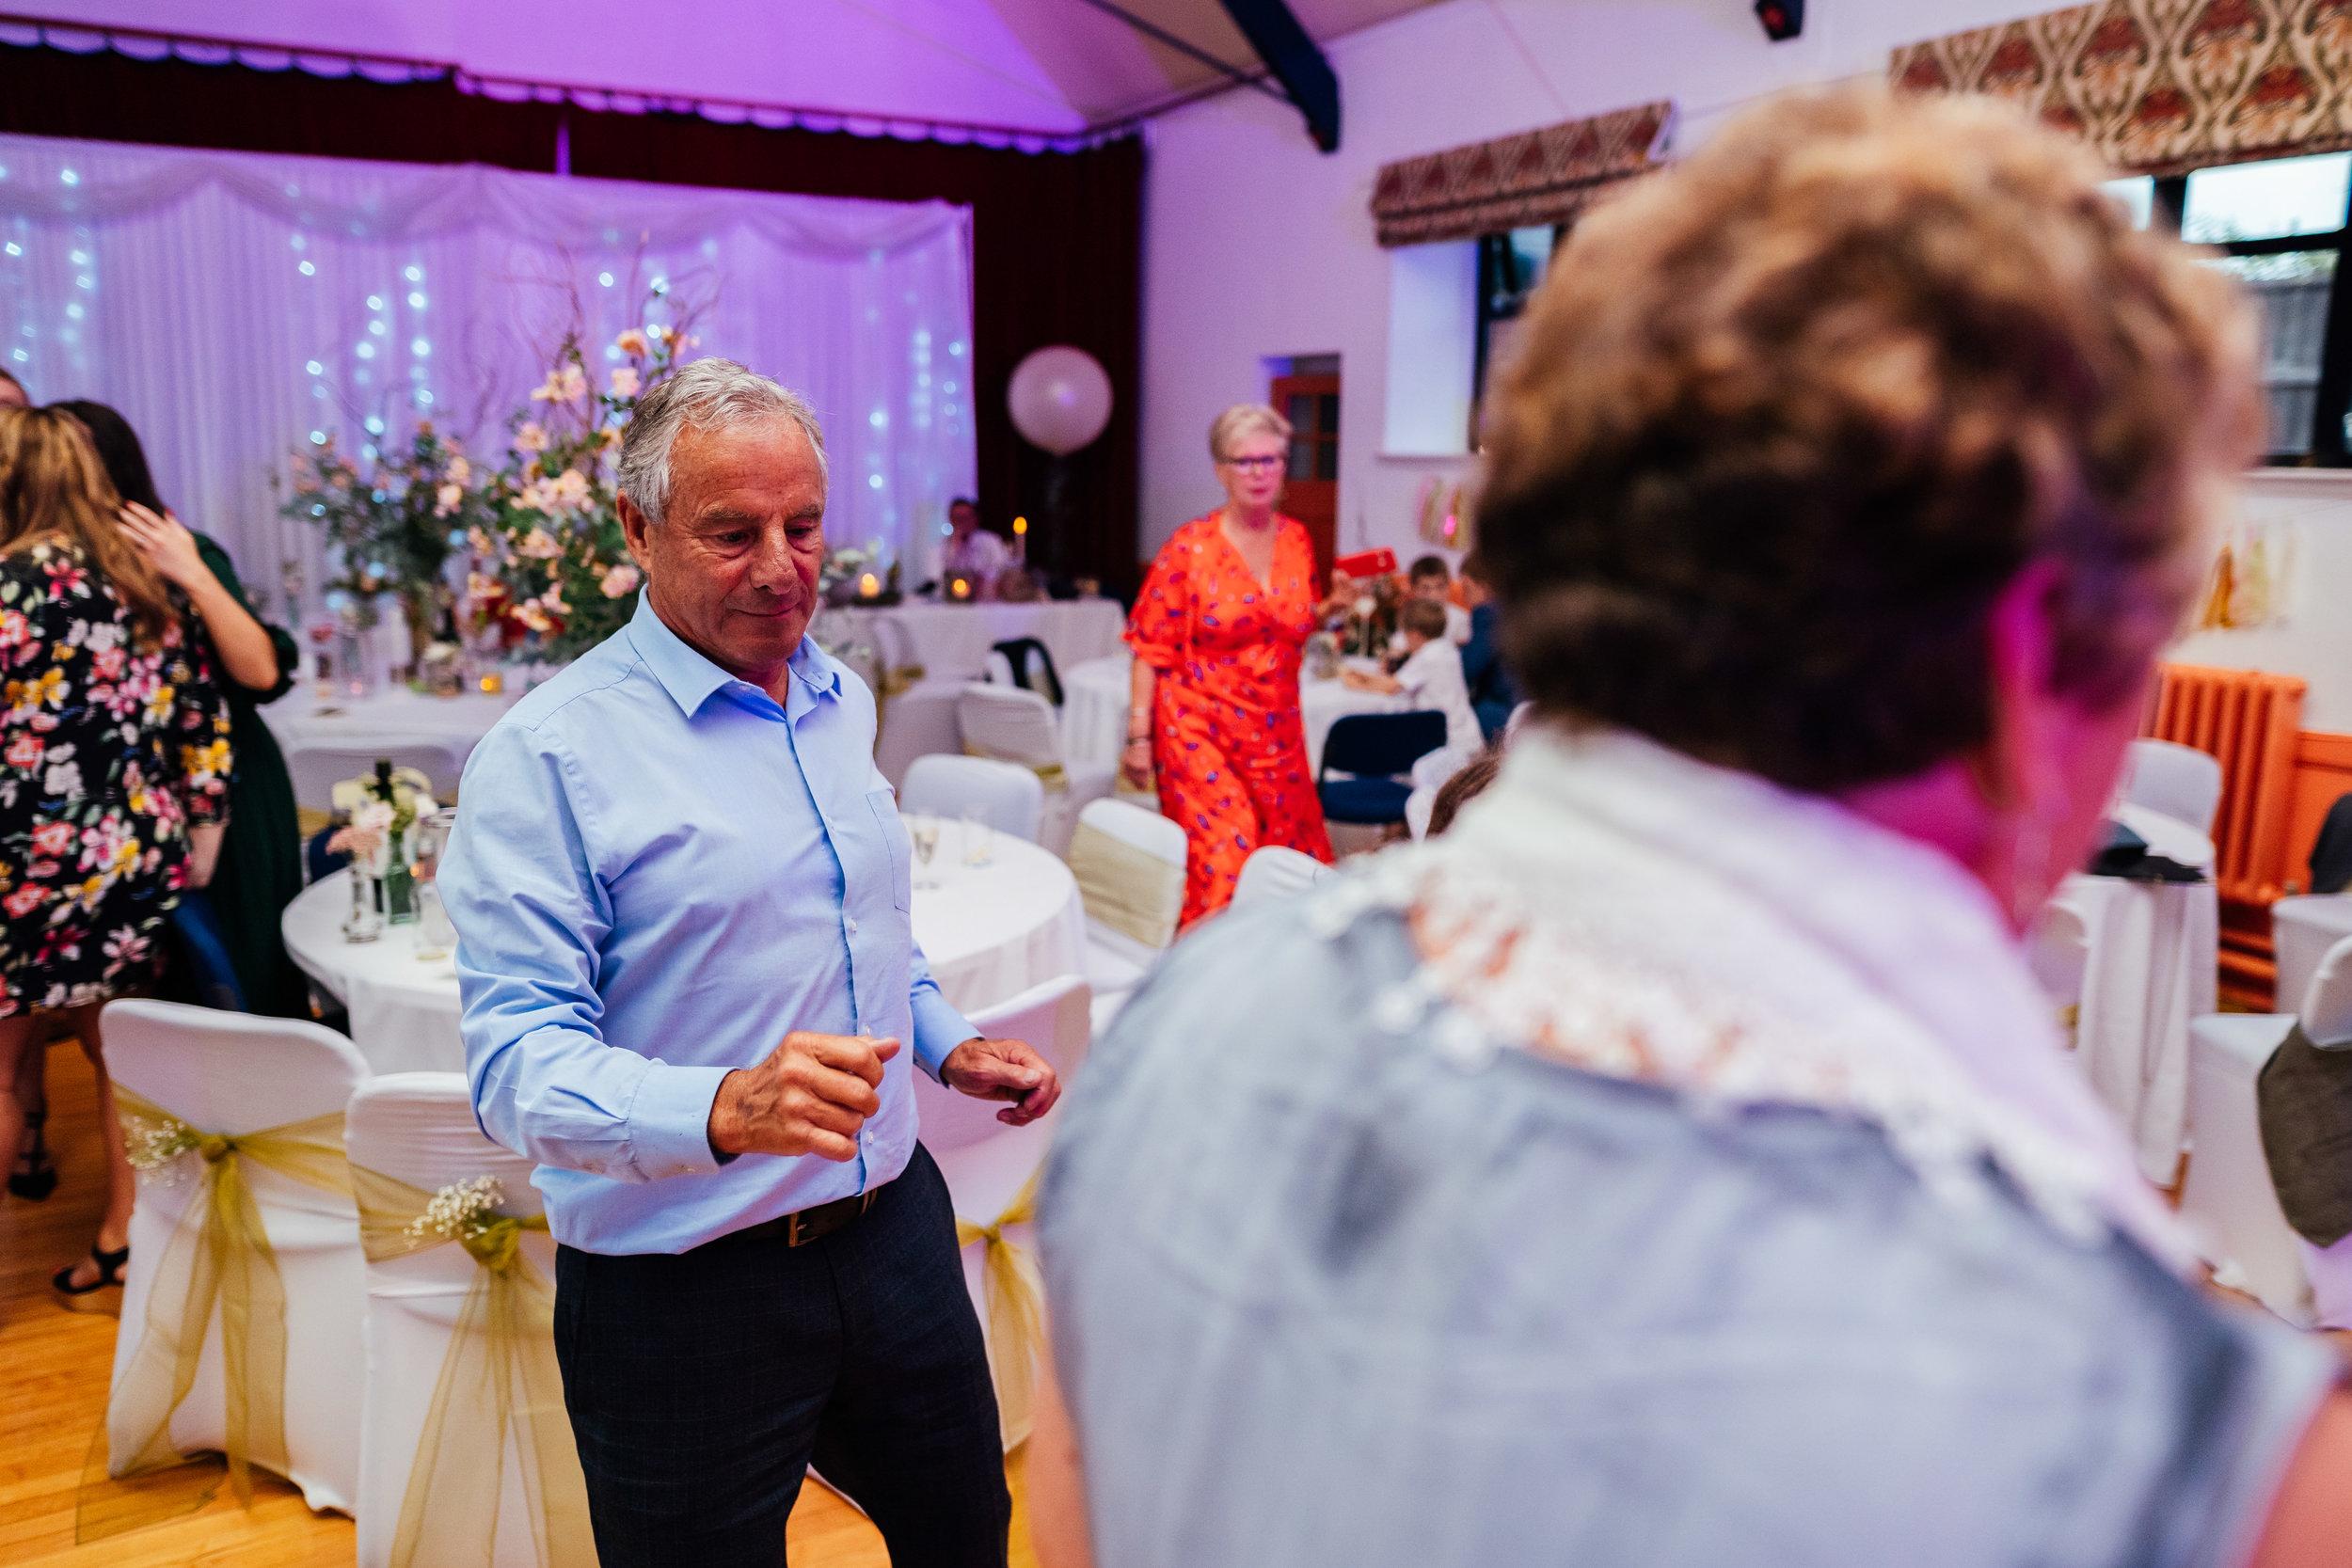 st-georges-hall-liverpool-wedding-356.jpg